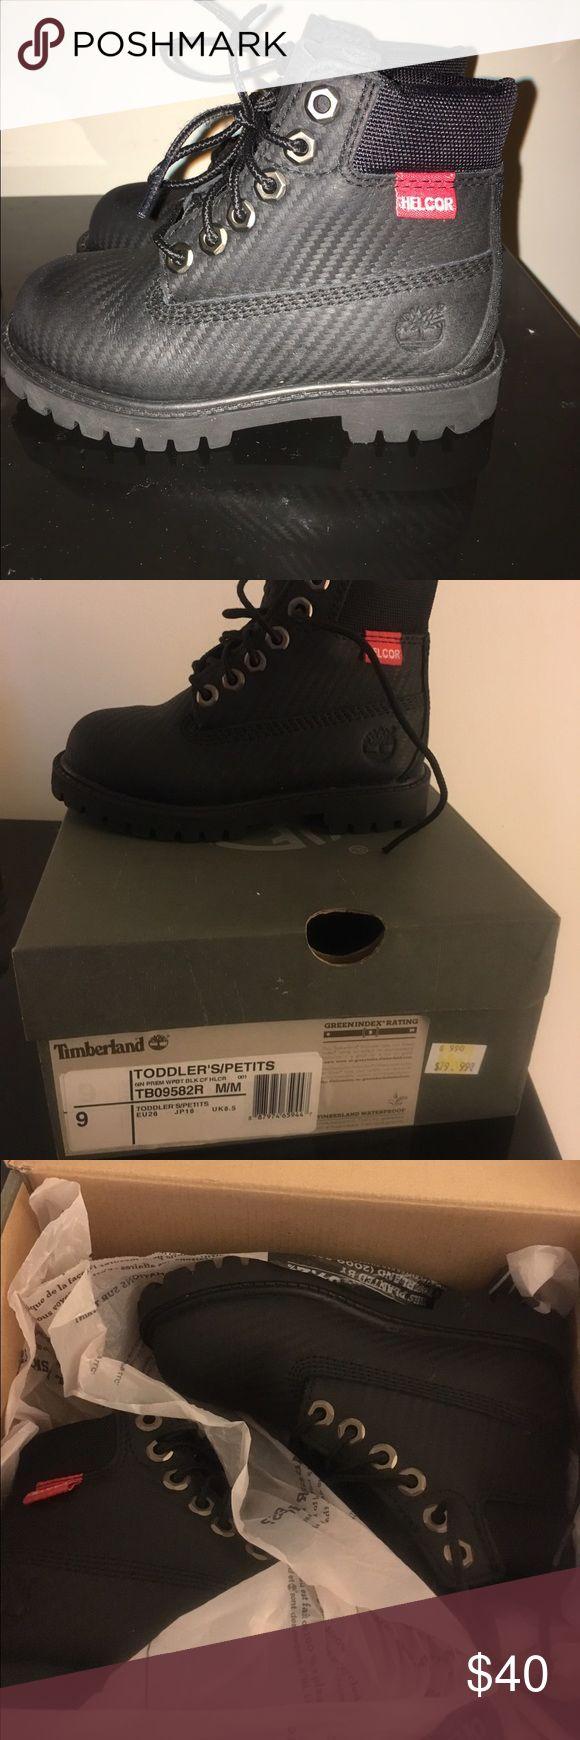 "Toddler Timberlands boot size 9 TIMBERLAND 6"" PREMIUM WATERPROOF BOOTS - BOYS' TODDLER  Black Rebar Size 9 Timberland Shoes Boots"